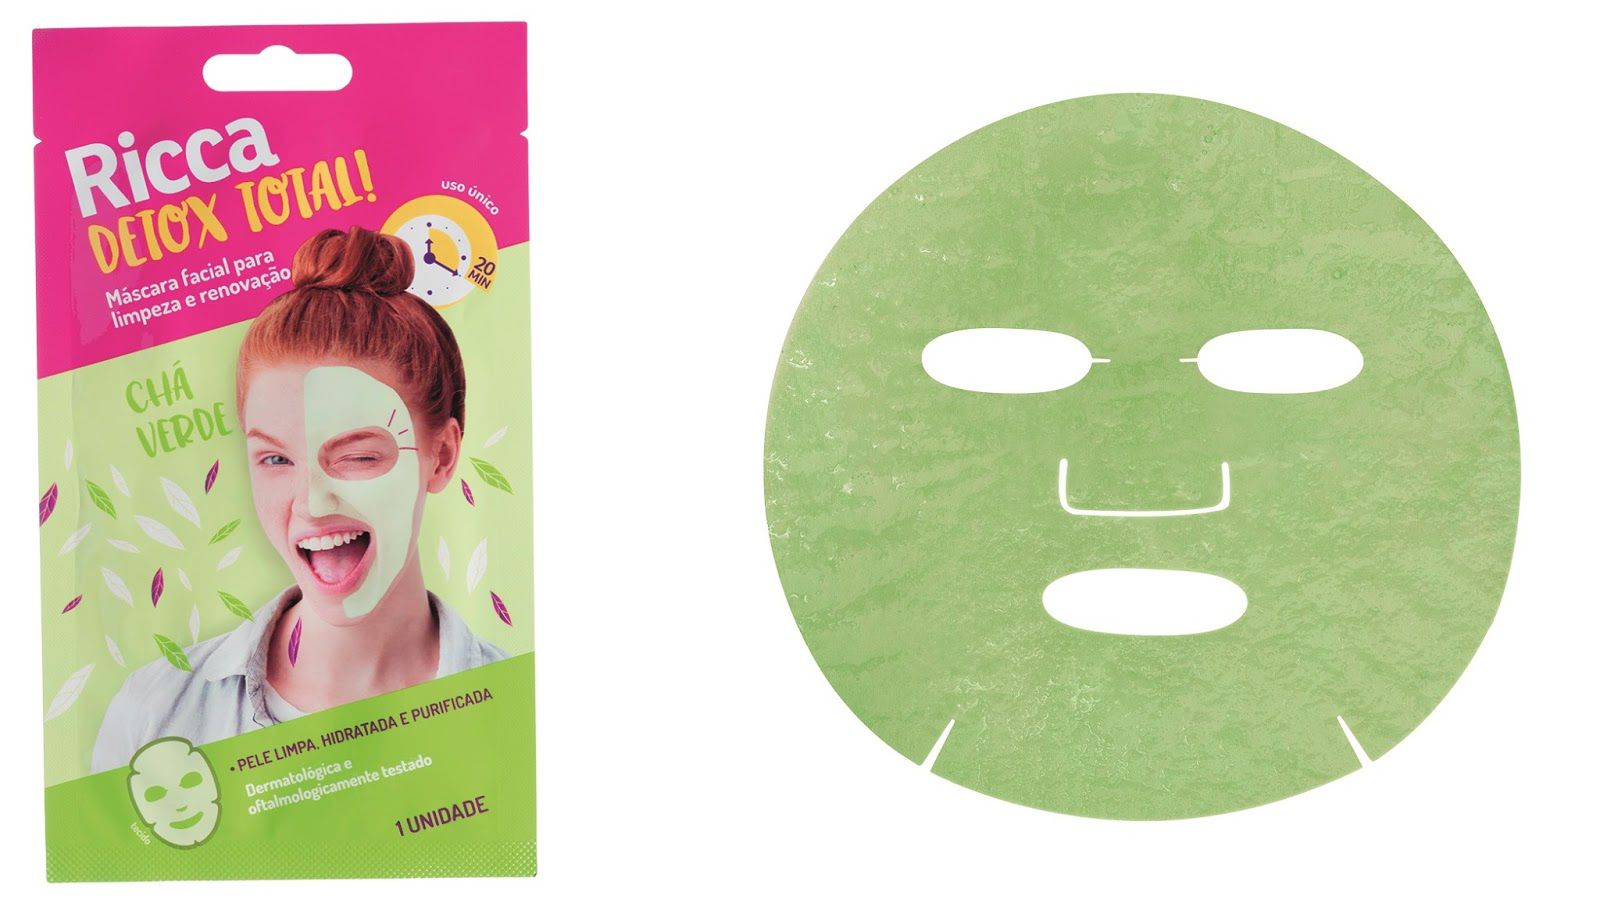 Máscara de Limpeza Facial Detox Total! - 1 unid. - Ricca